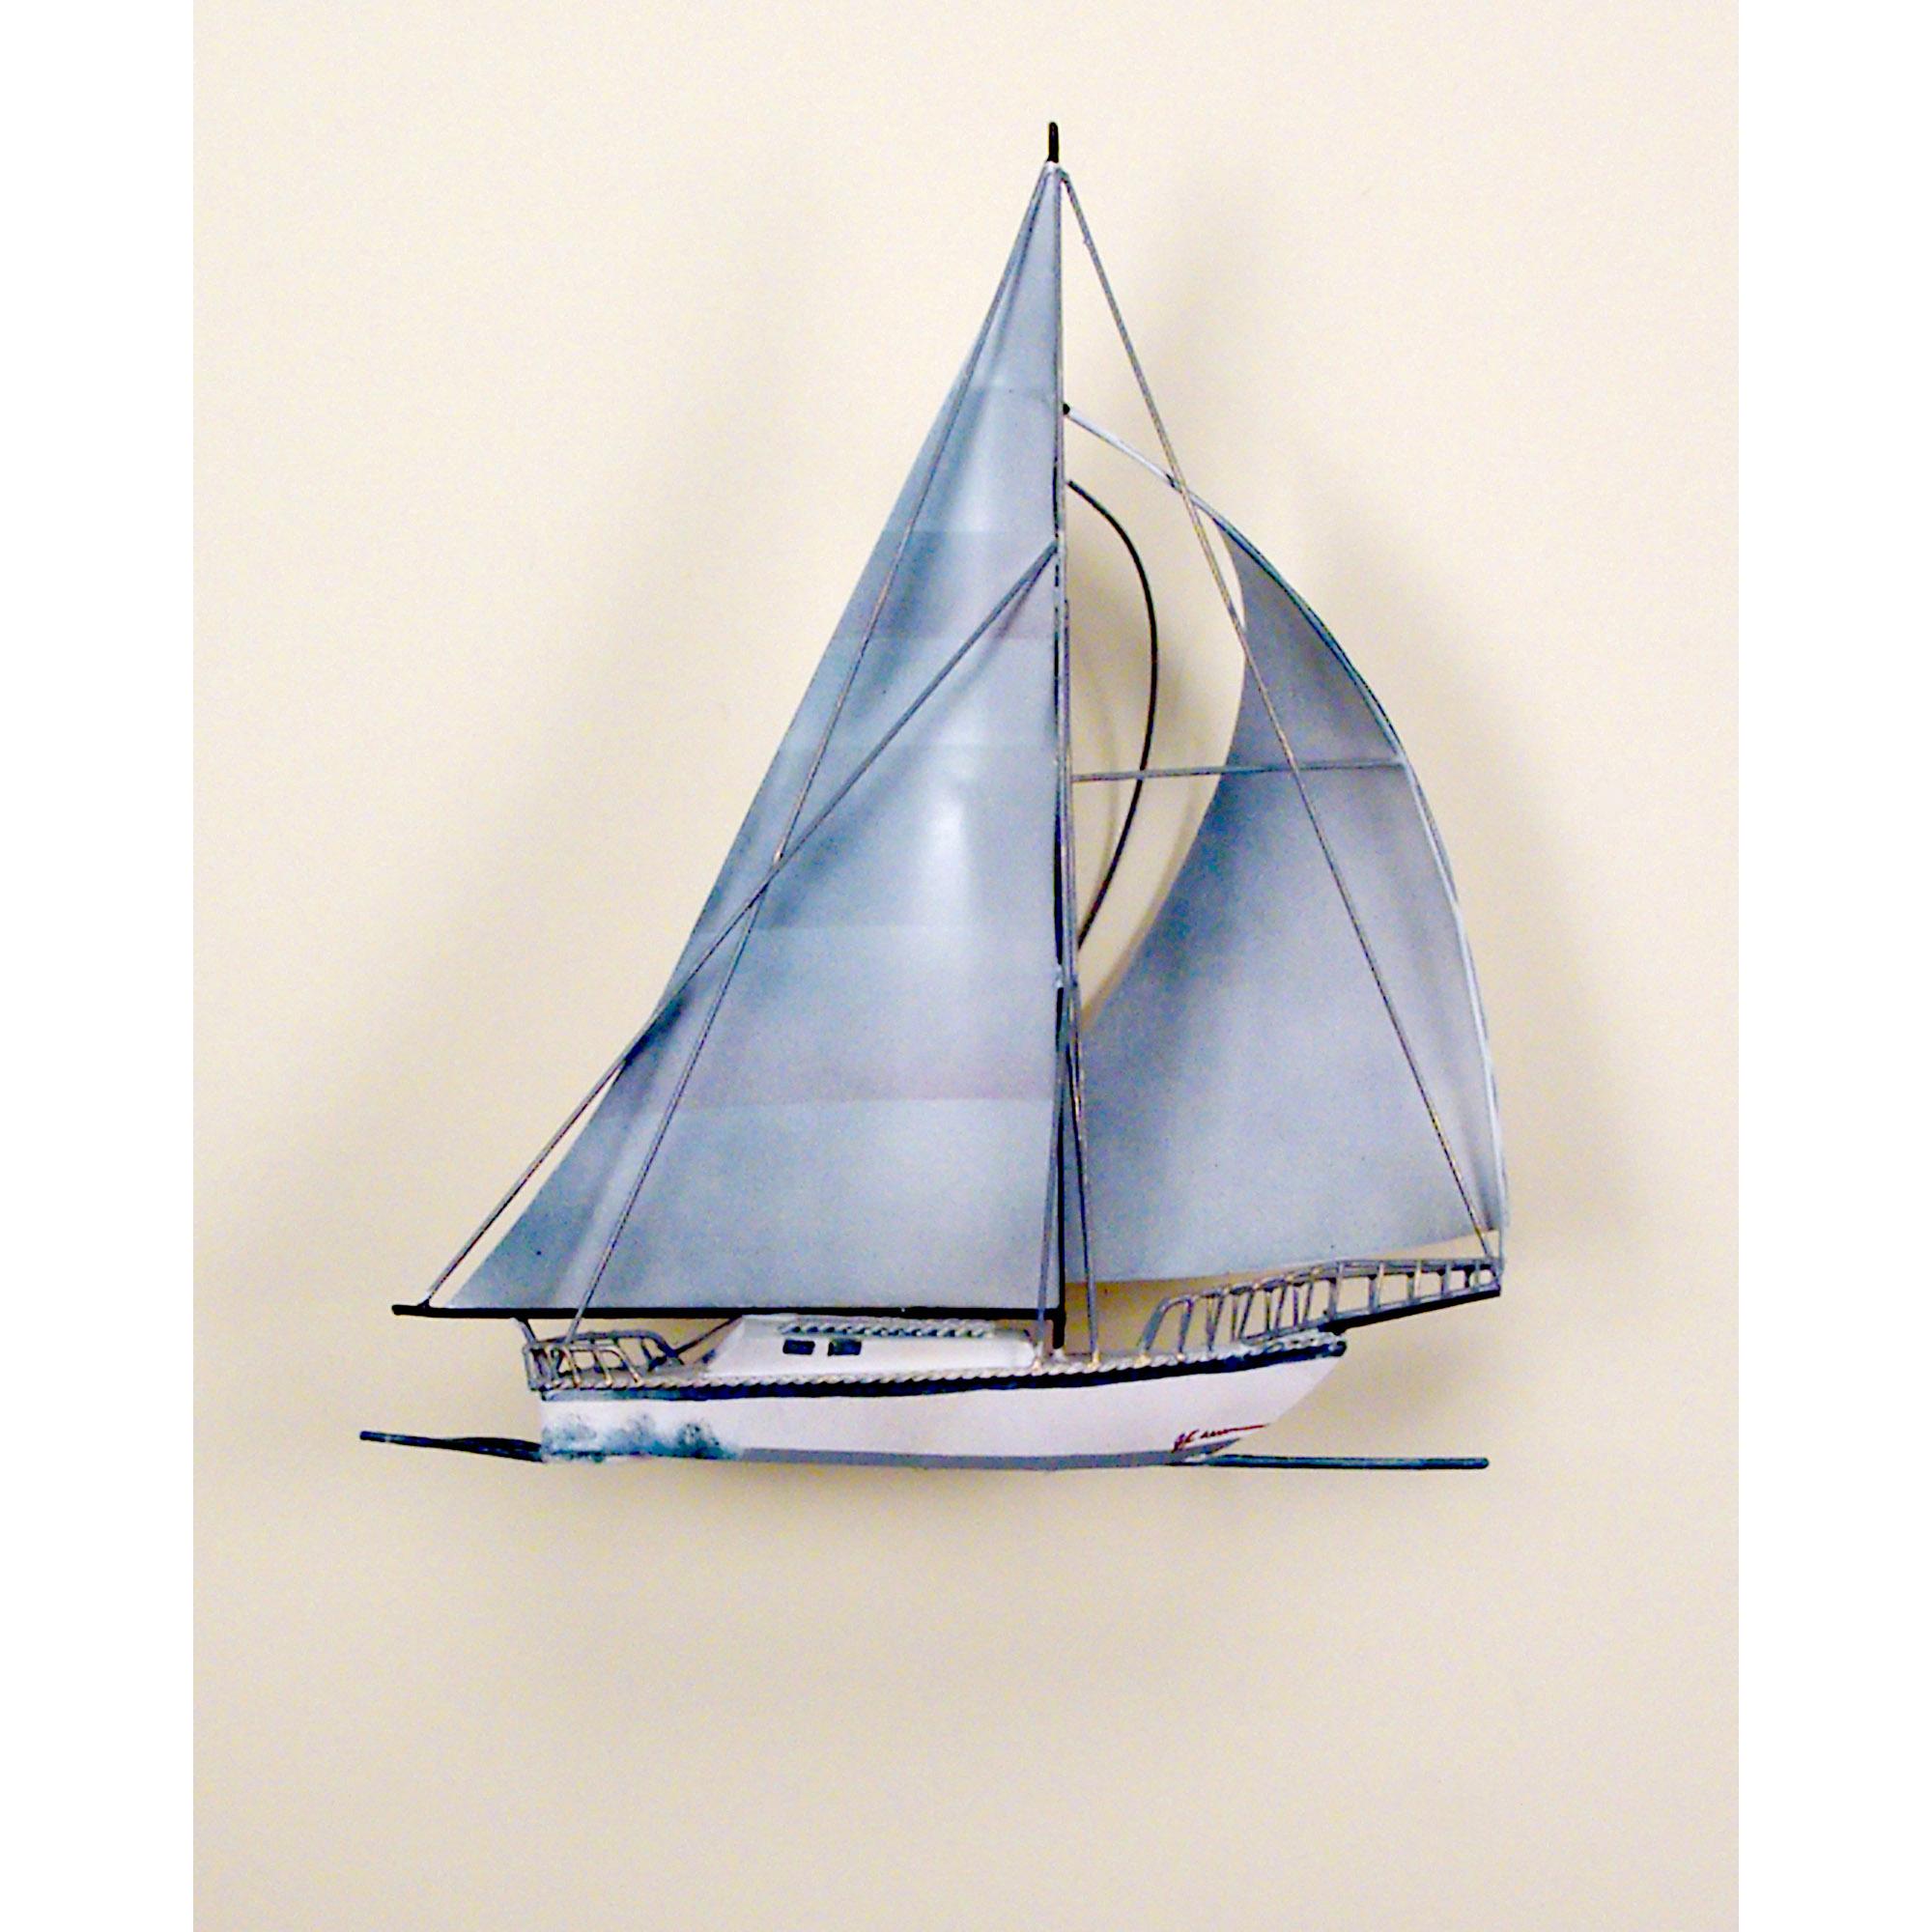 Sailboat Wall Art windjamer sailboat, single, ocean, boat, nautical, sailing